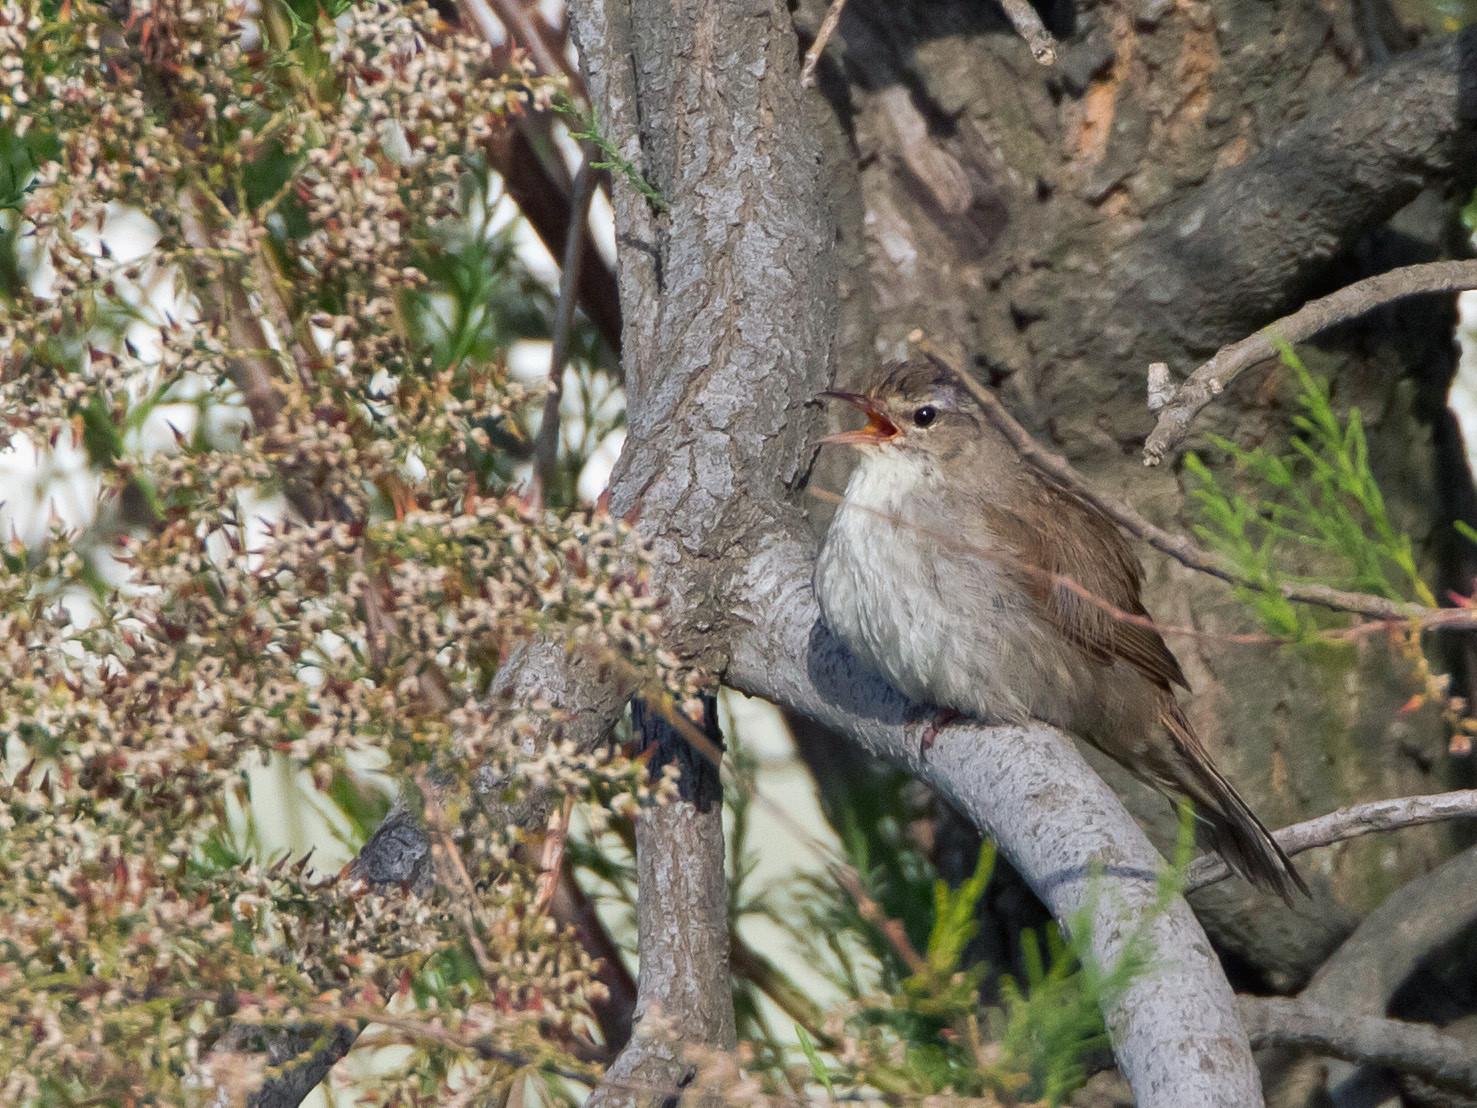 Hier singt der Seidensänger pausenlos in den Büschen...